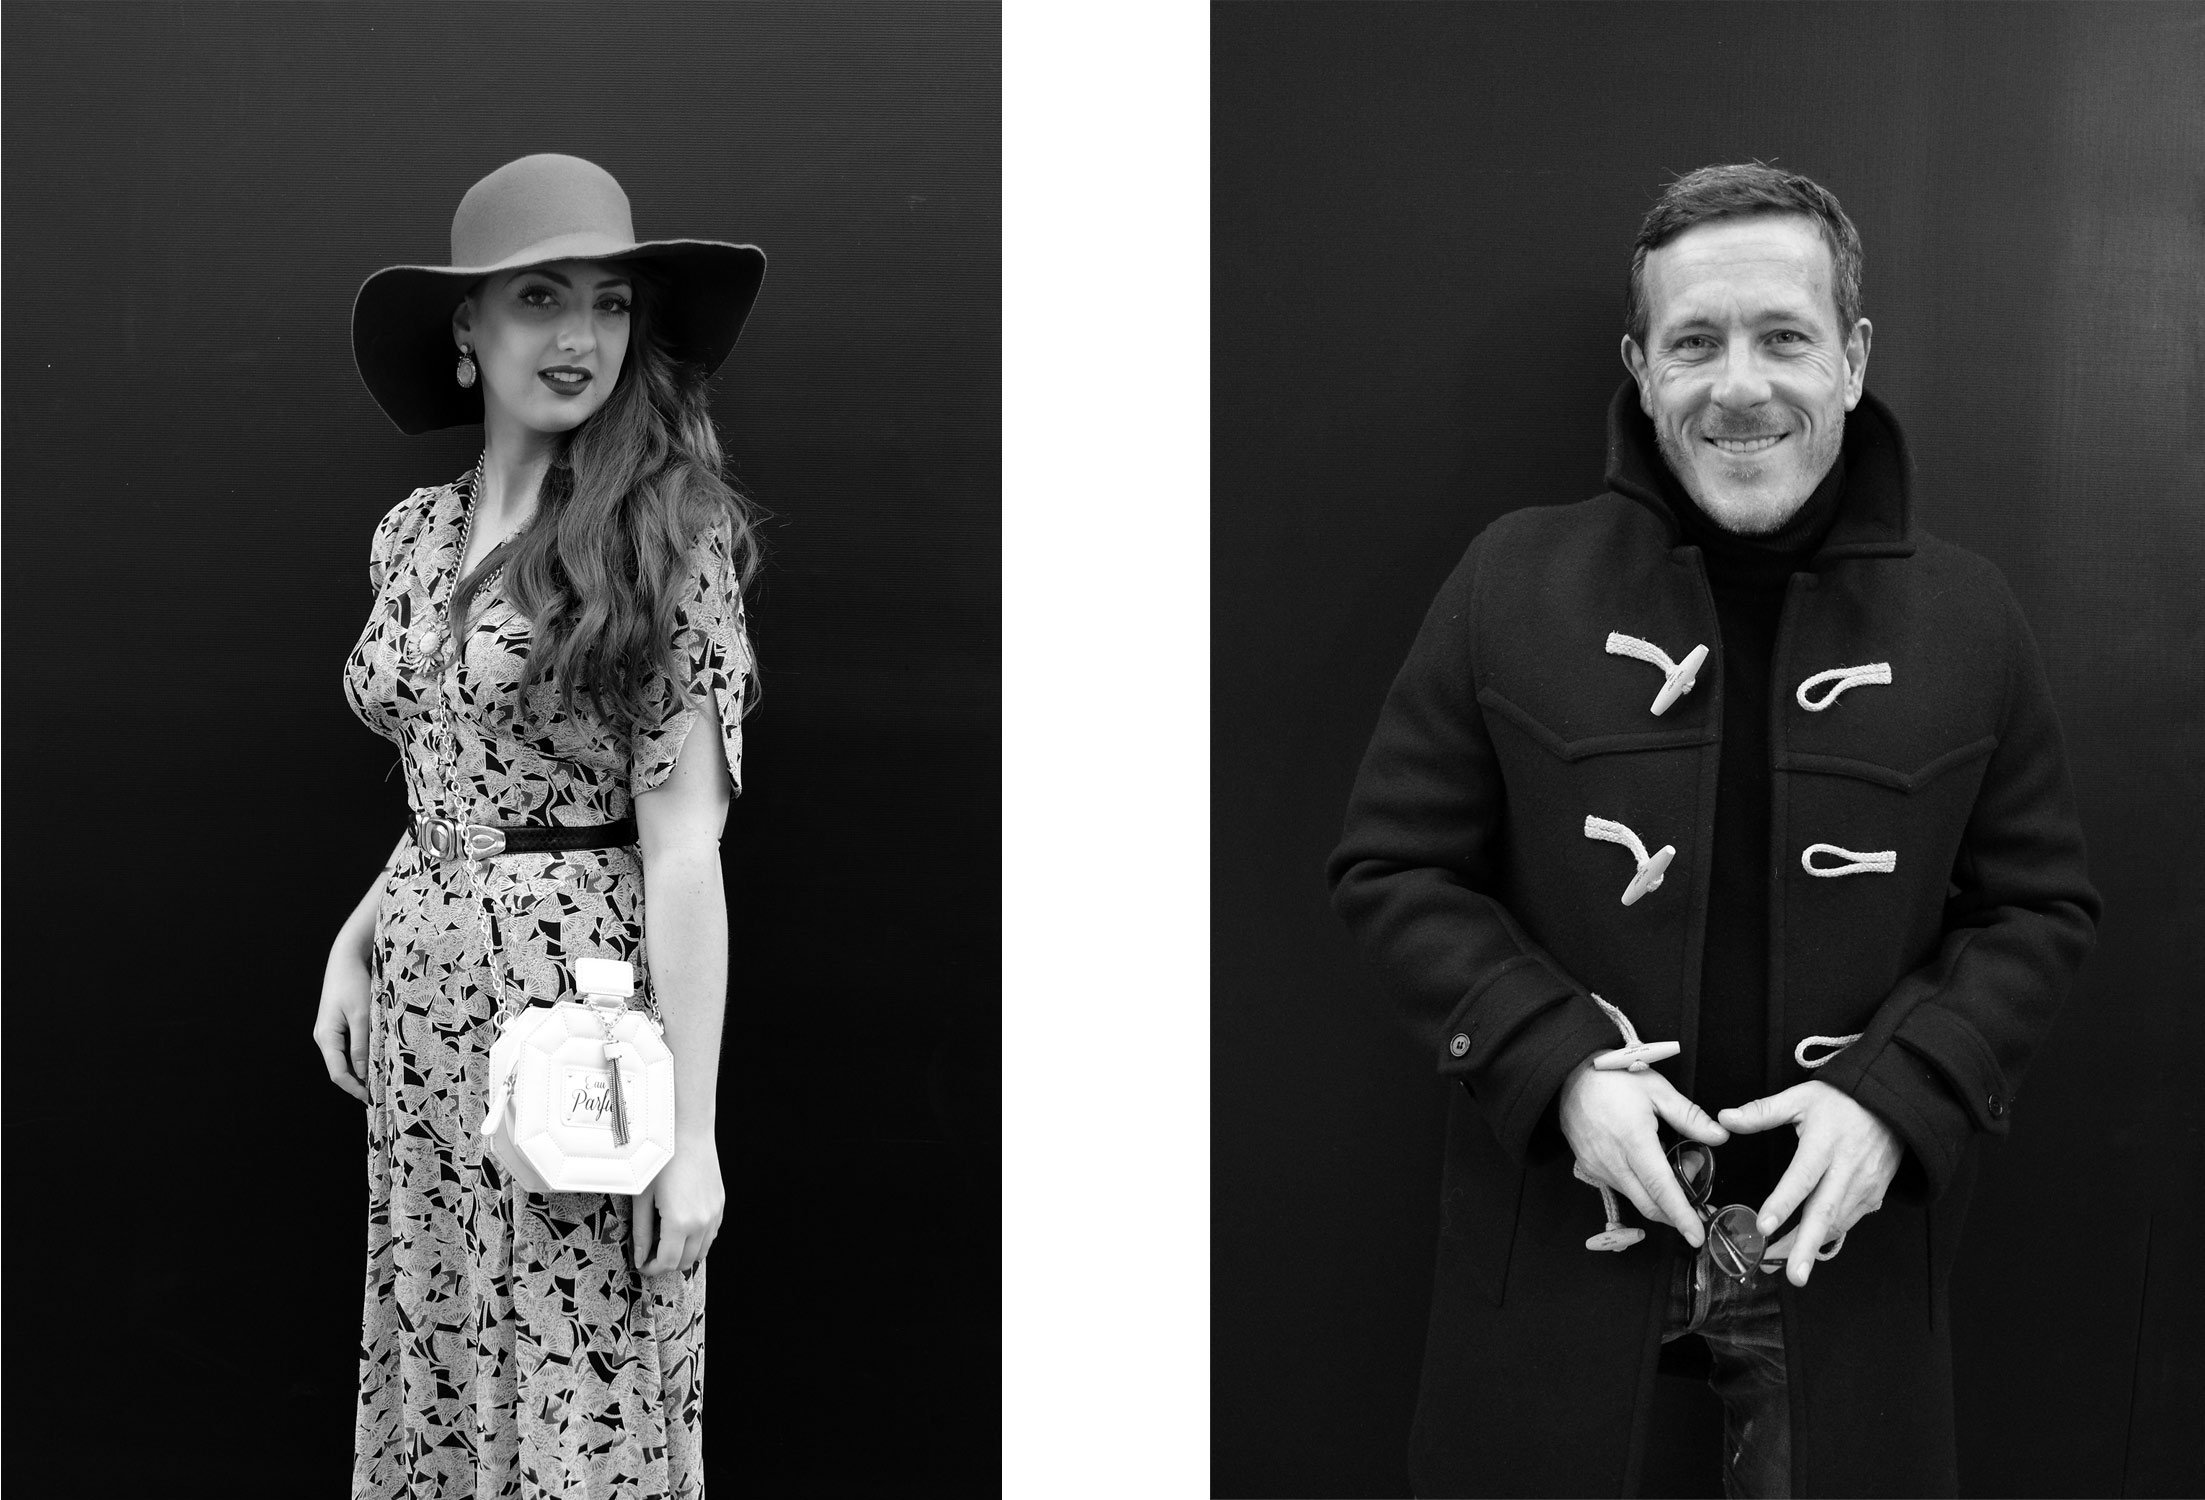 LONDON FASHION WEEK 2014 - FACES